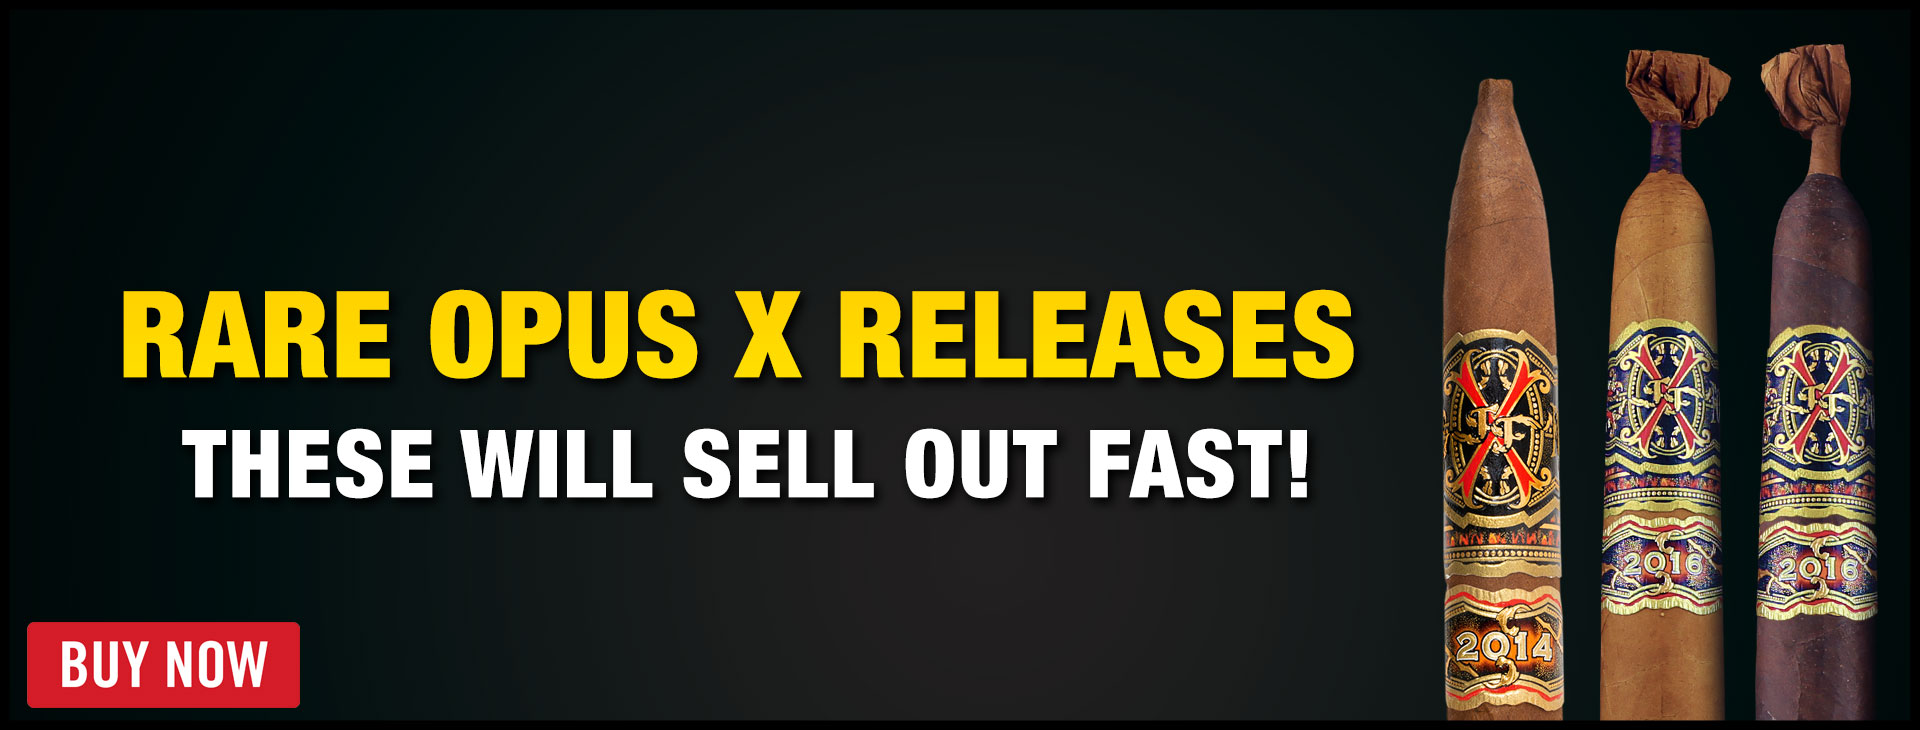 opus-x-releases-2021-banner.jpg